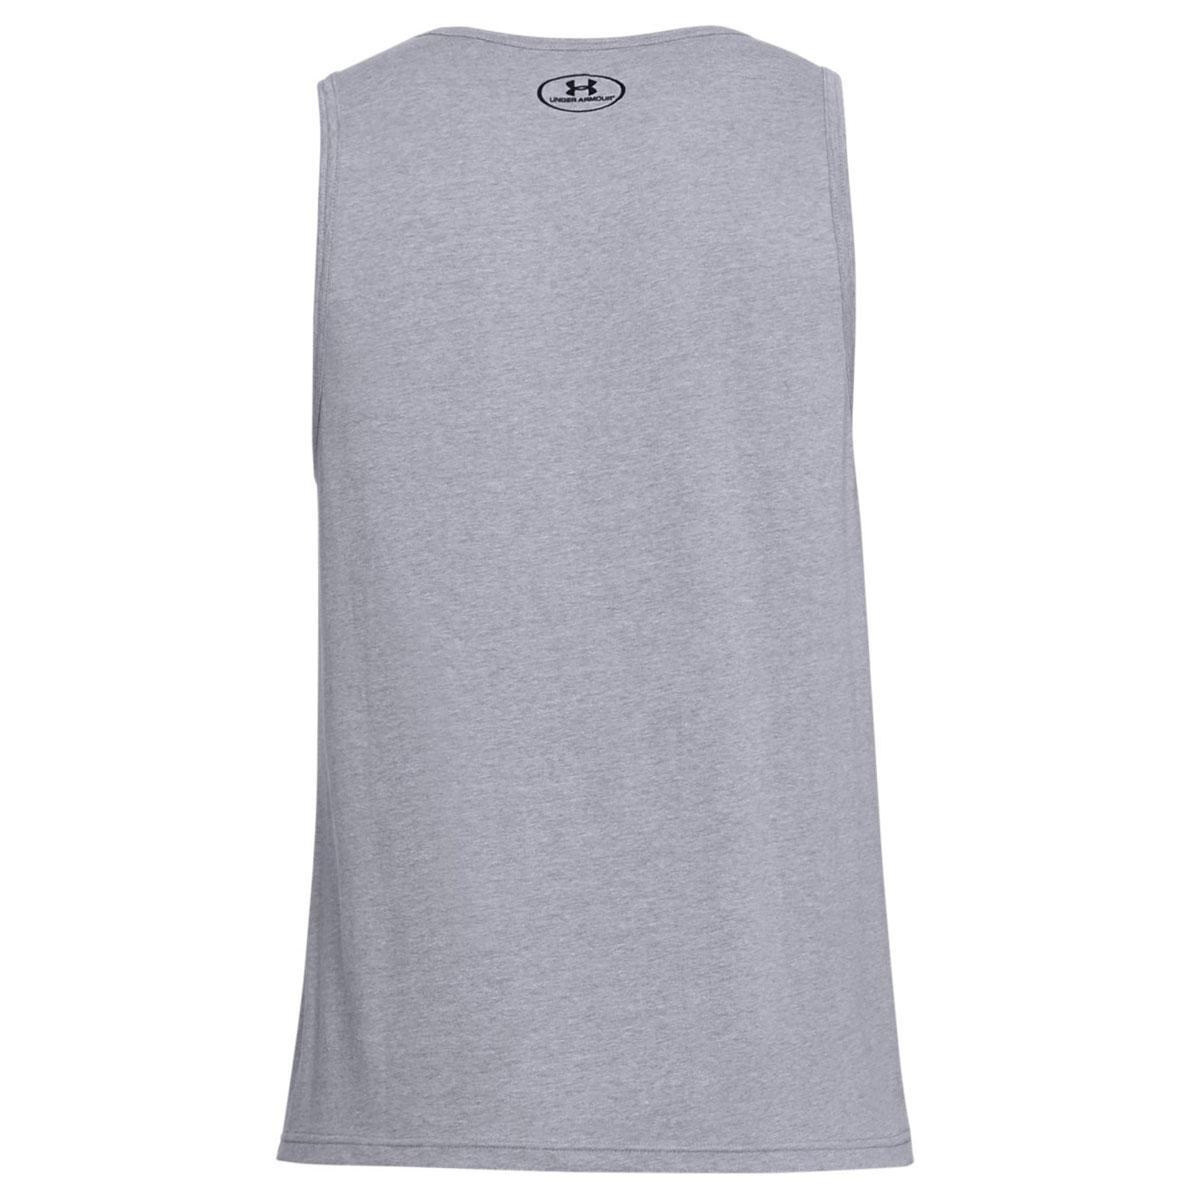 Under-Armour-Mens-2019-Sportstyle-Logo-Tank-Soft-Sleeveless-Cotton-Vest Indexbild 6